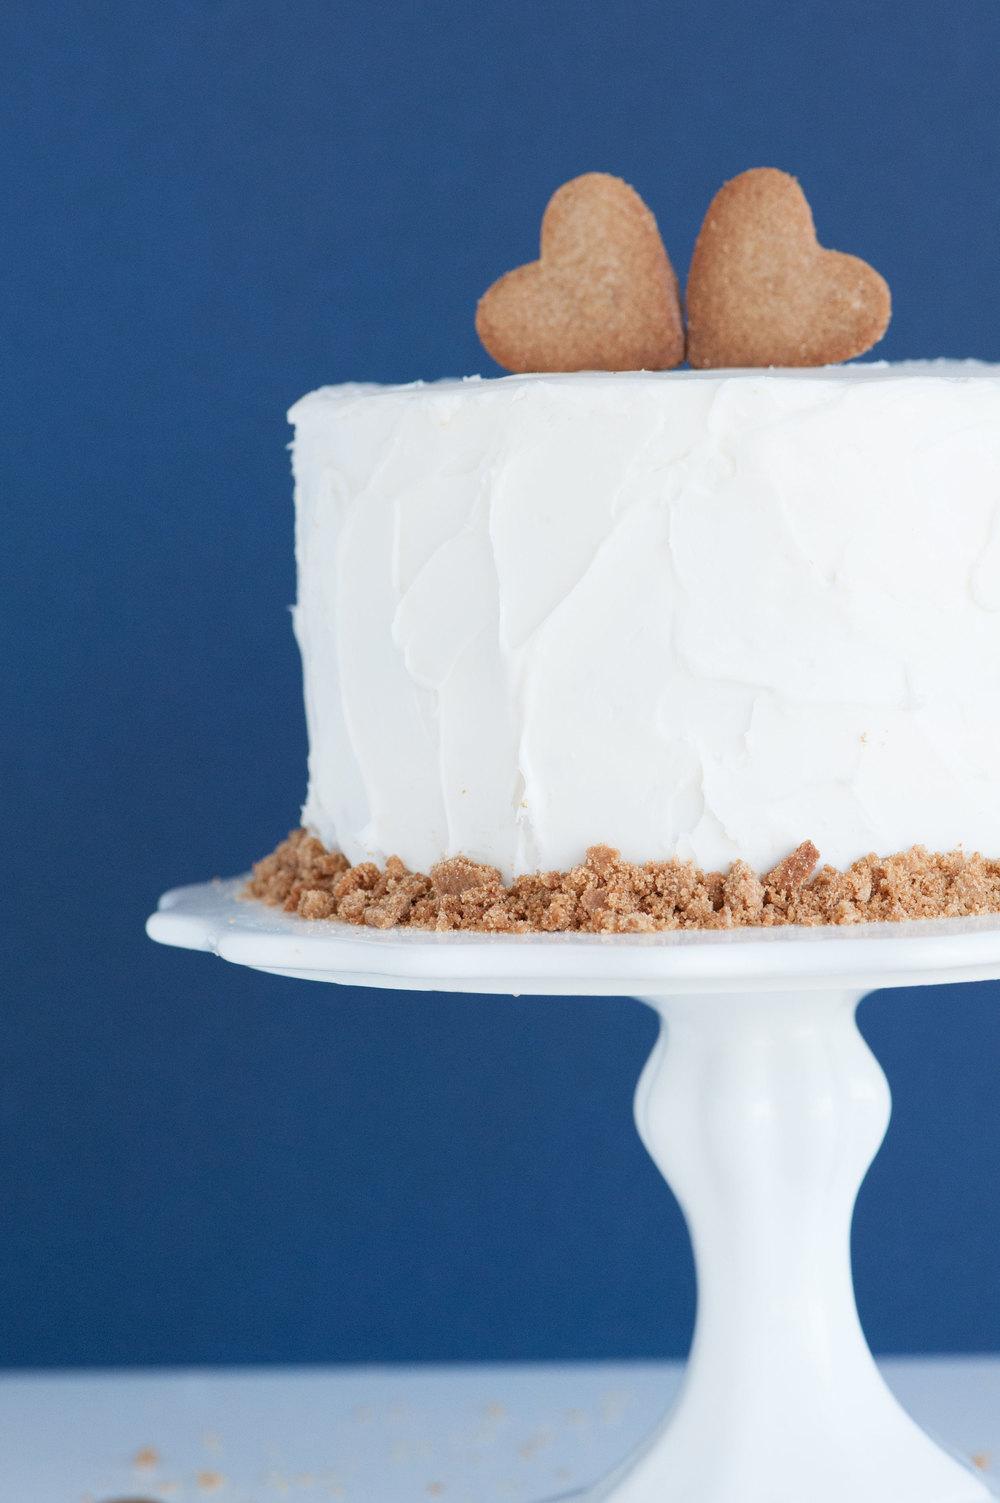 Lindsay Nathanson | Cakes